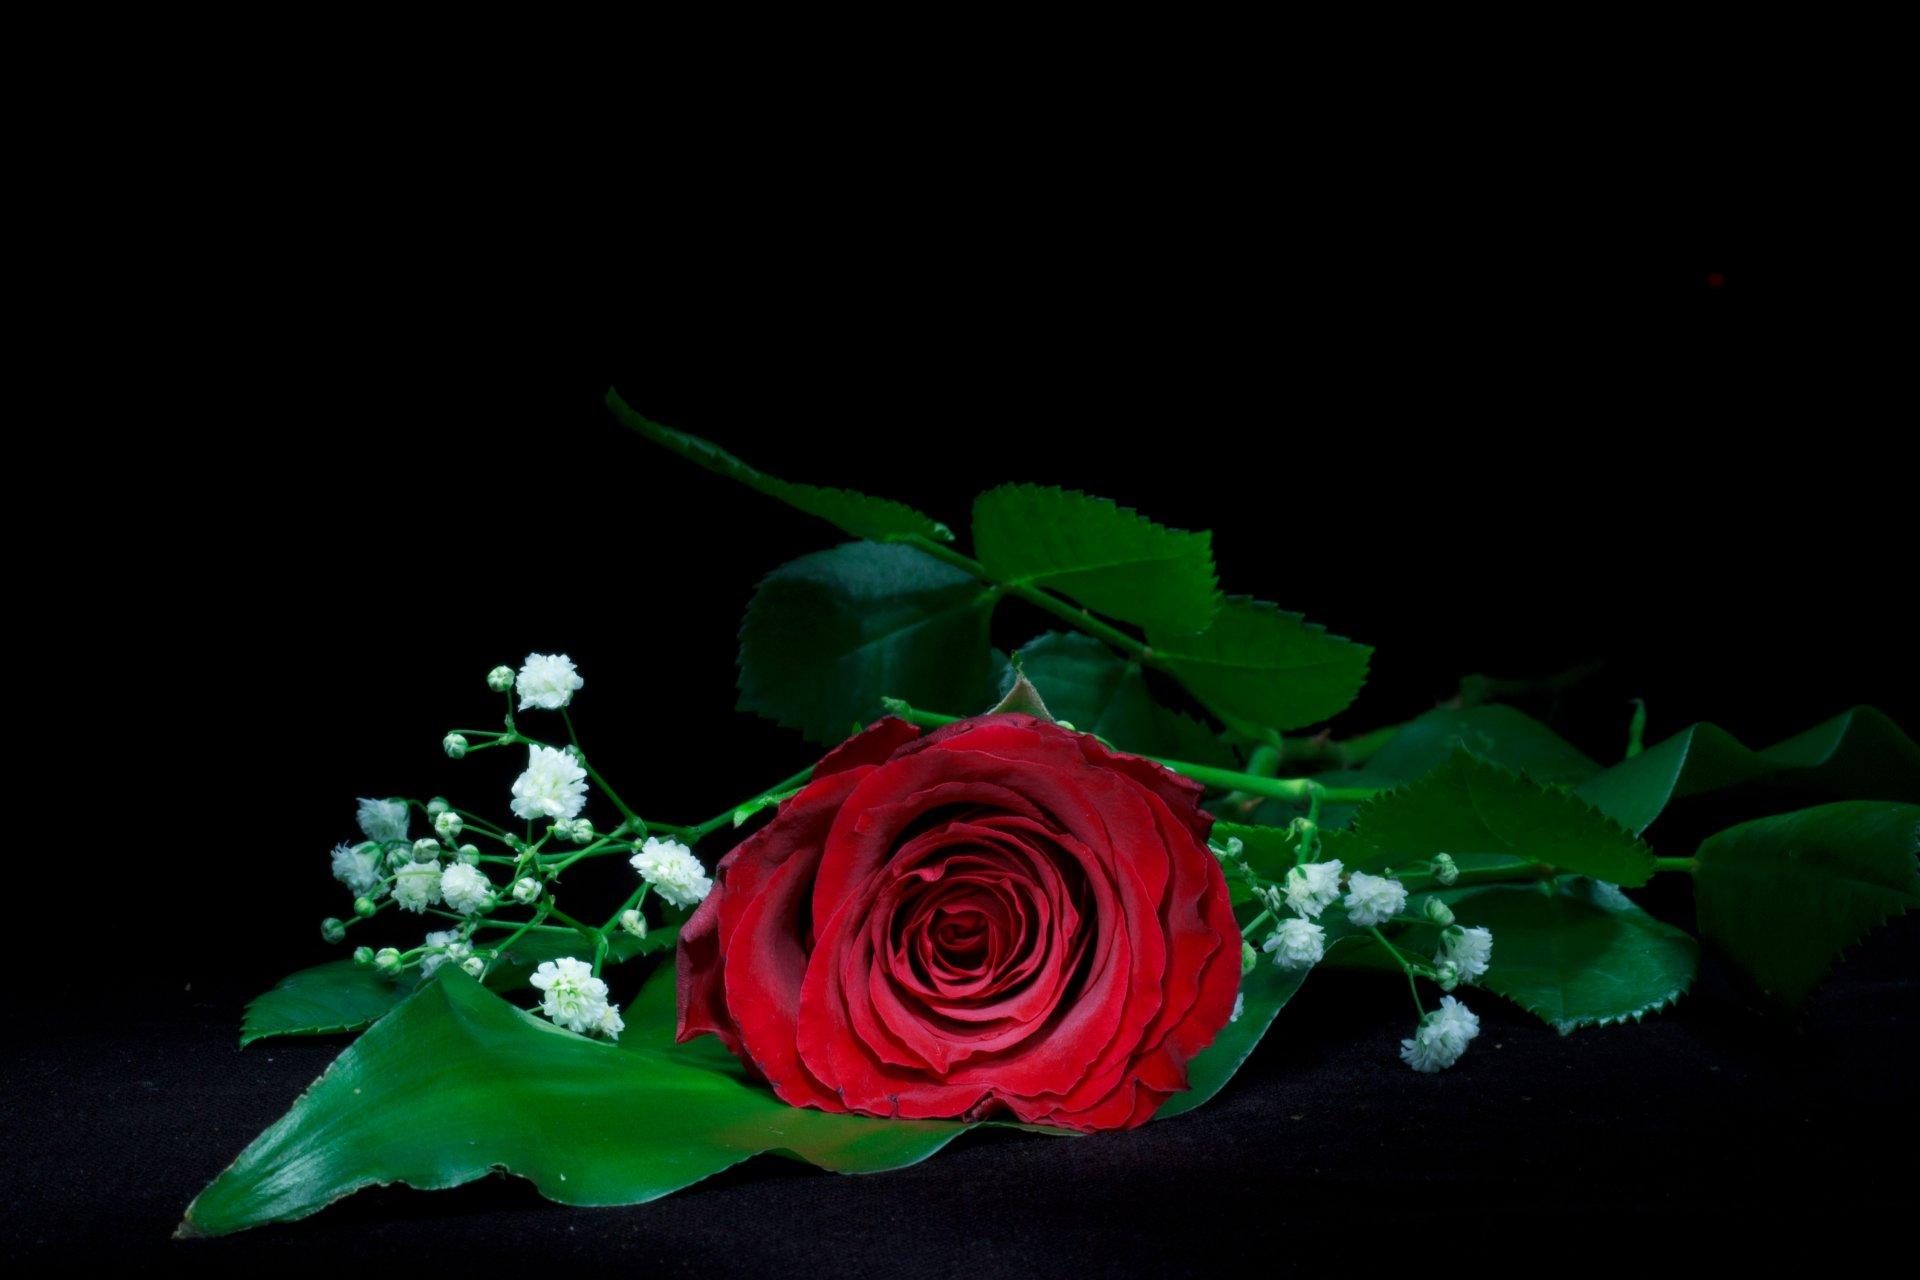 Single Red Rose 4k Ultra Hd Wallpaper Background Image